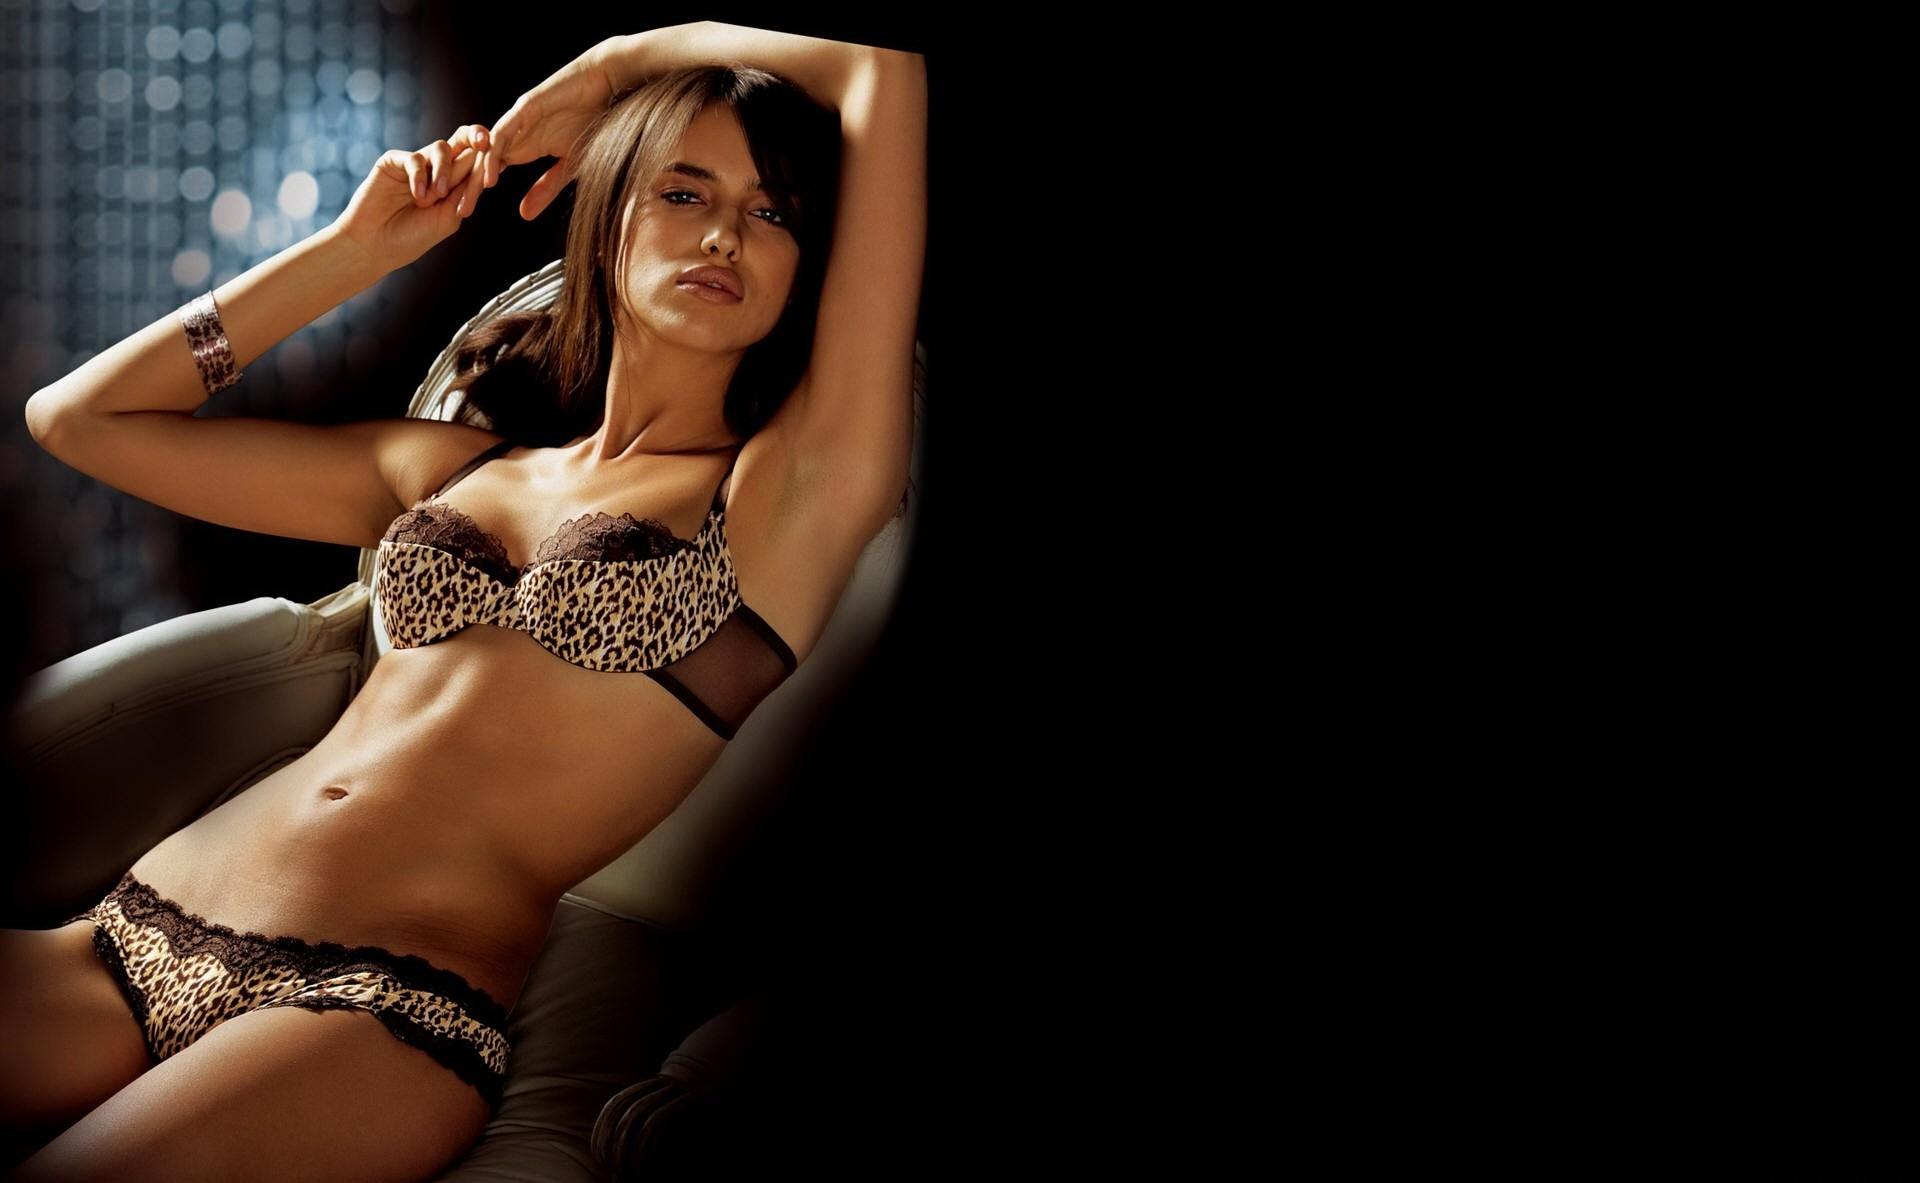 erotisk fotografering escort kvinder